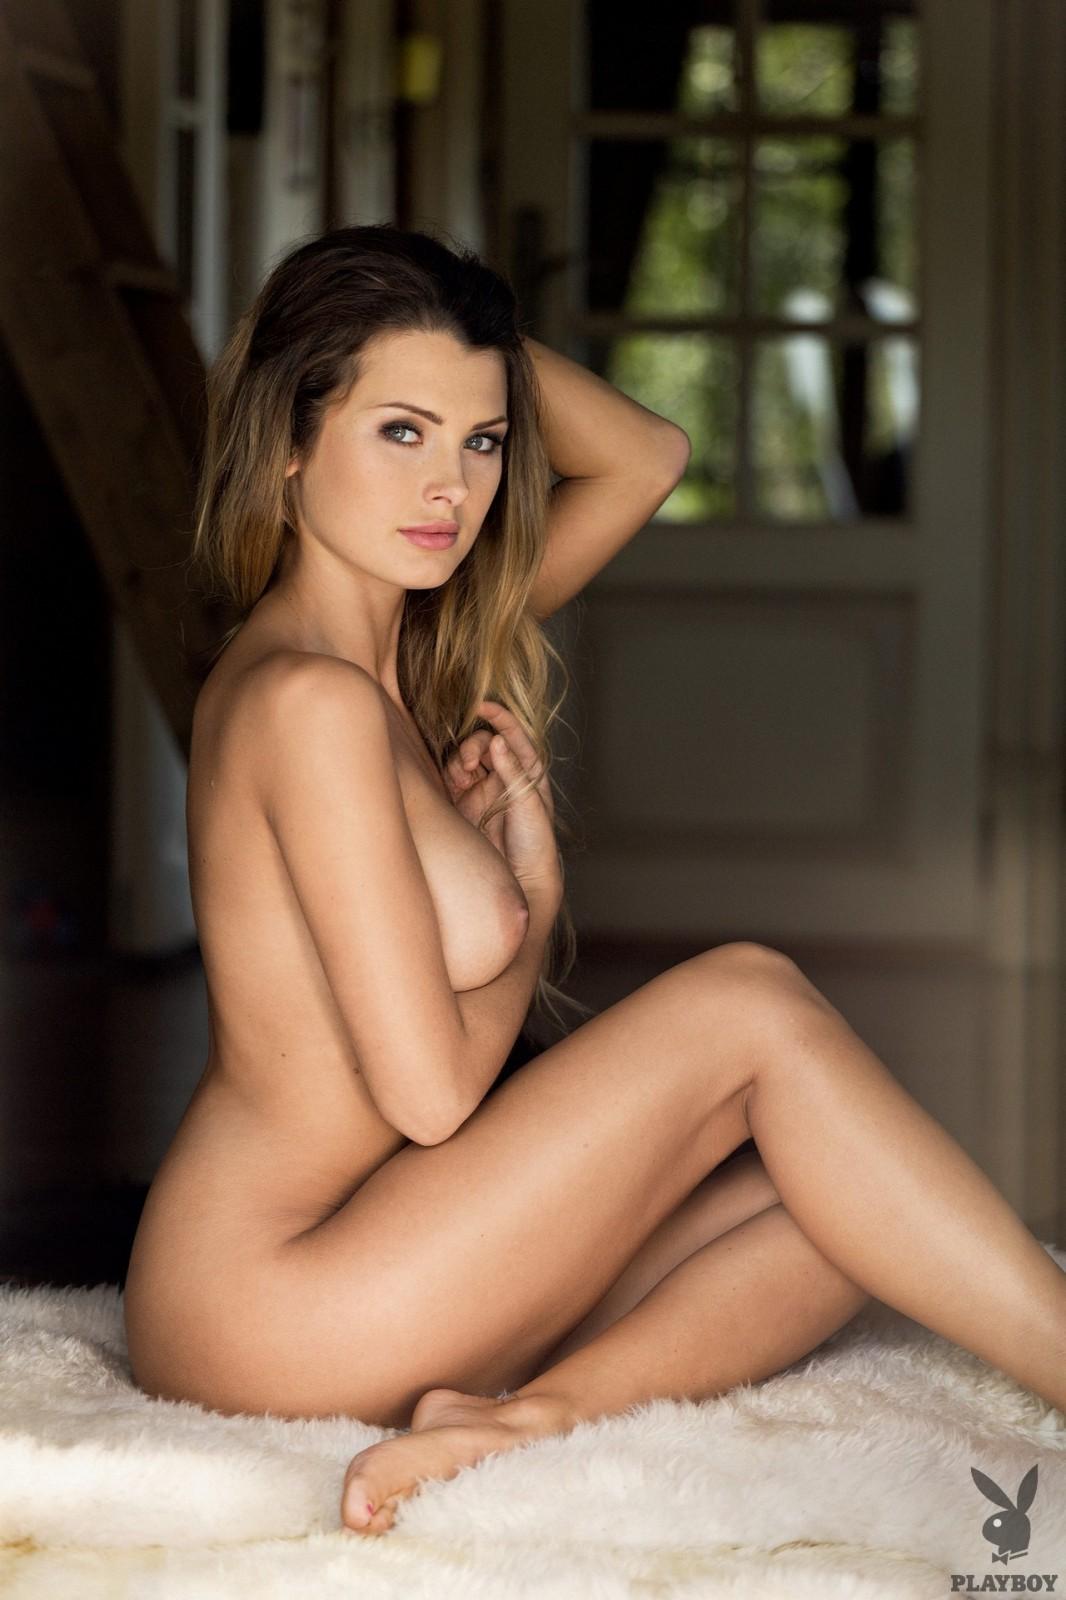 XXX Klaudia Skogmo nudes (59 photos), Ass, Paparazzi, Selfie, in bikini 2017